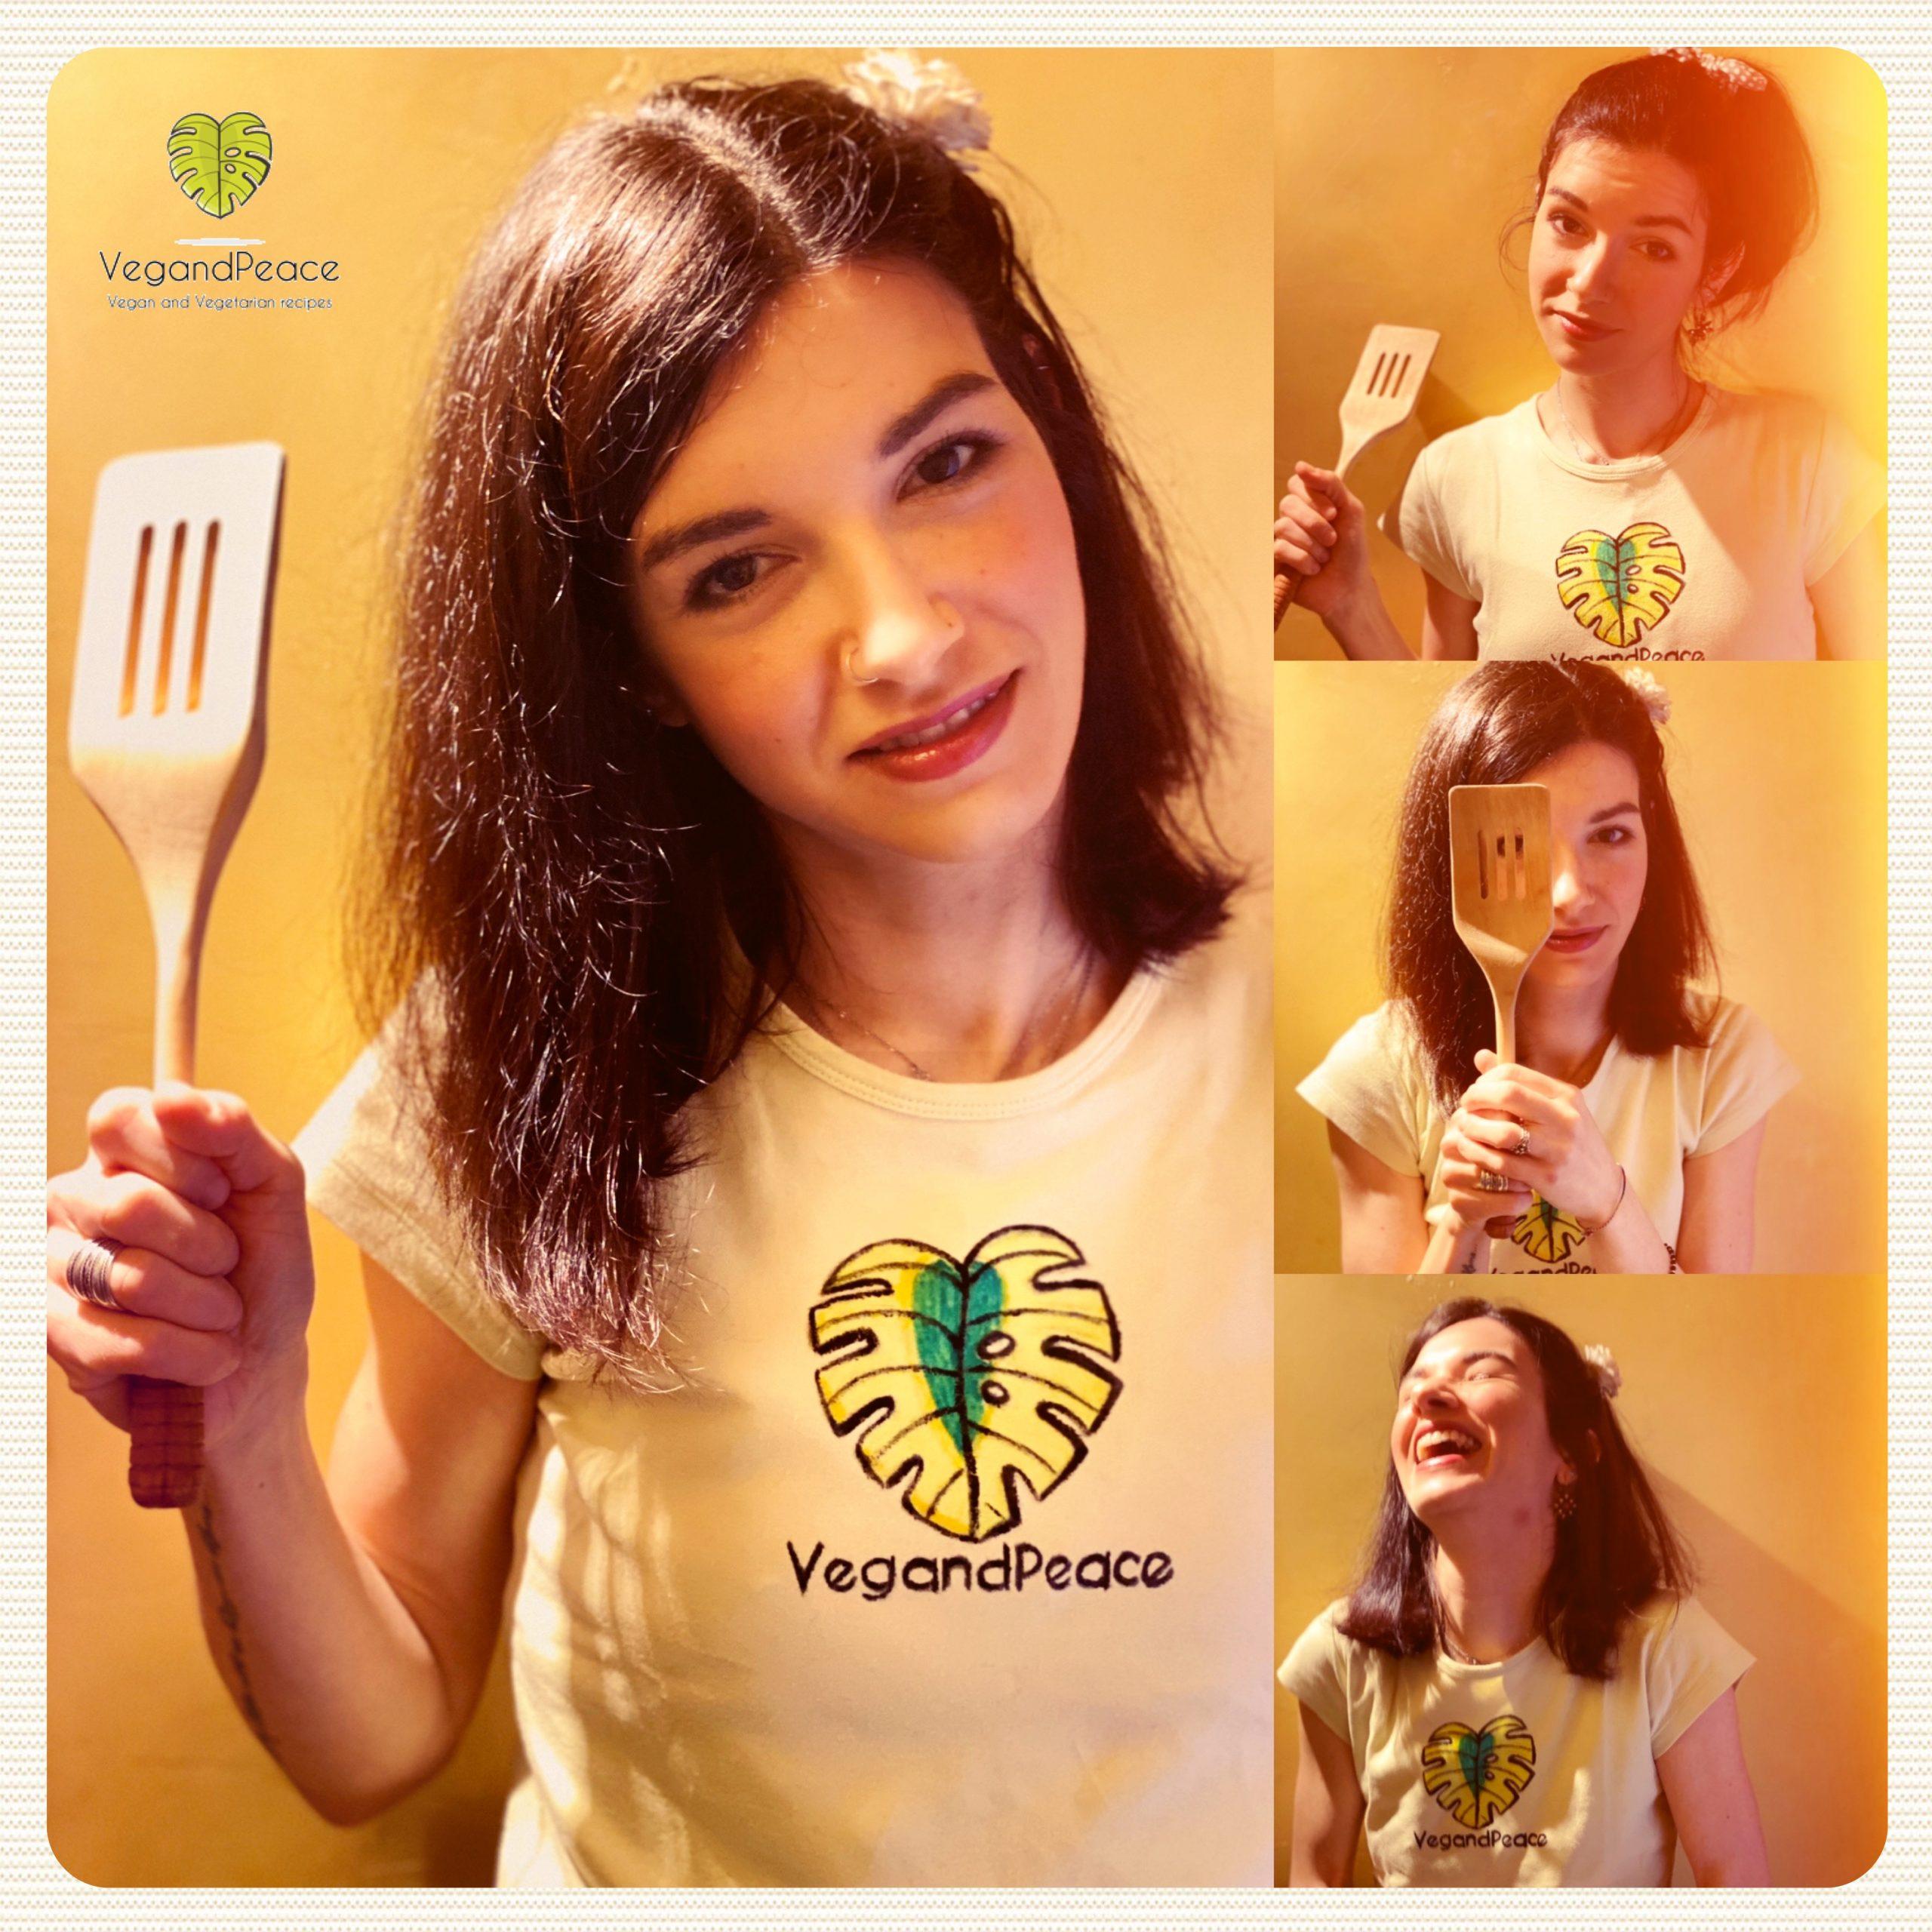 Giulia VegandPeace